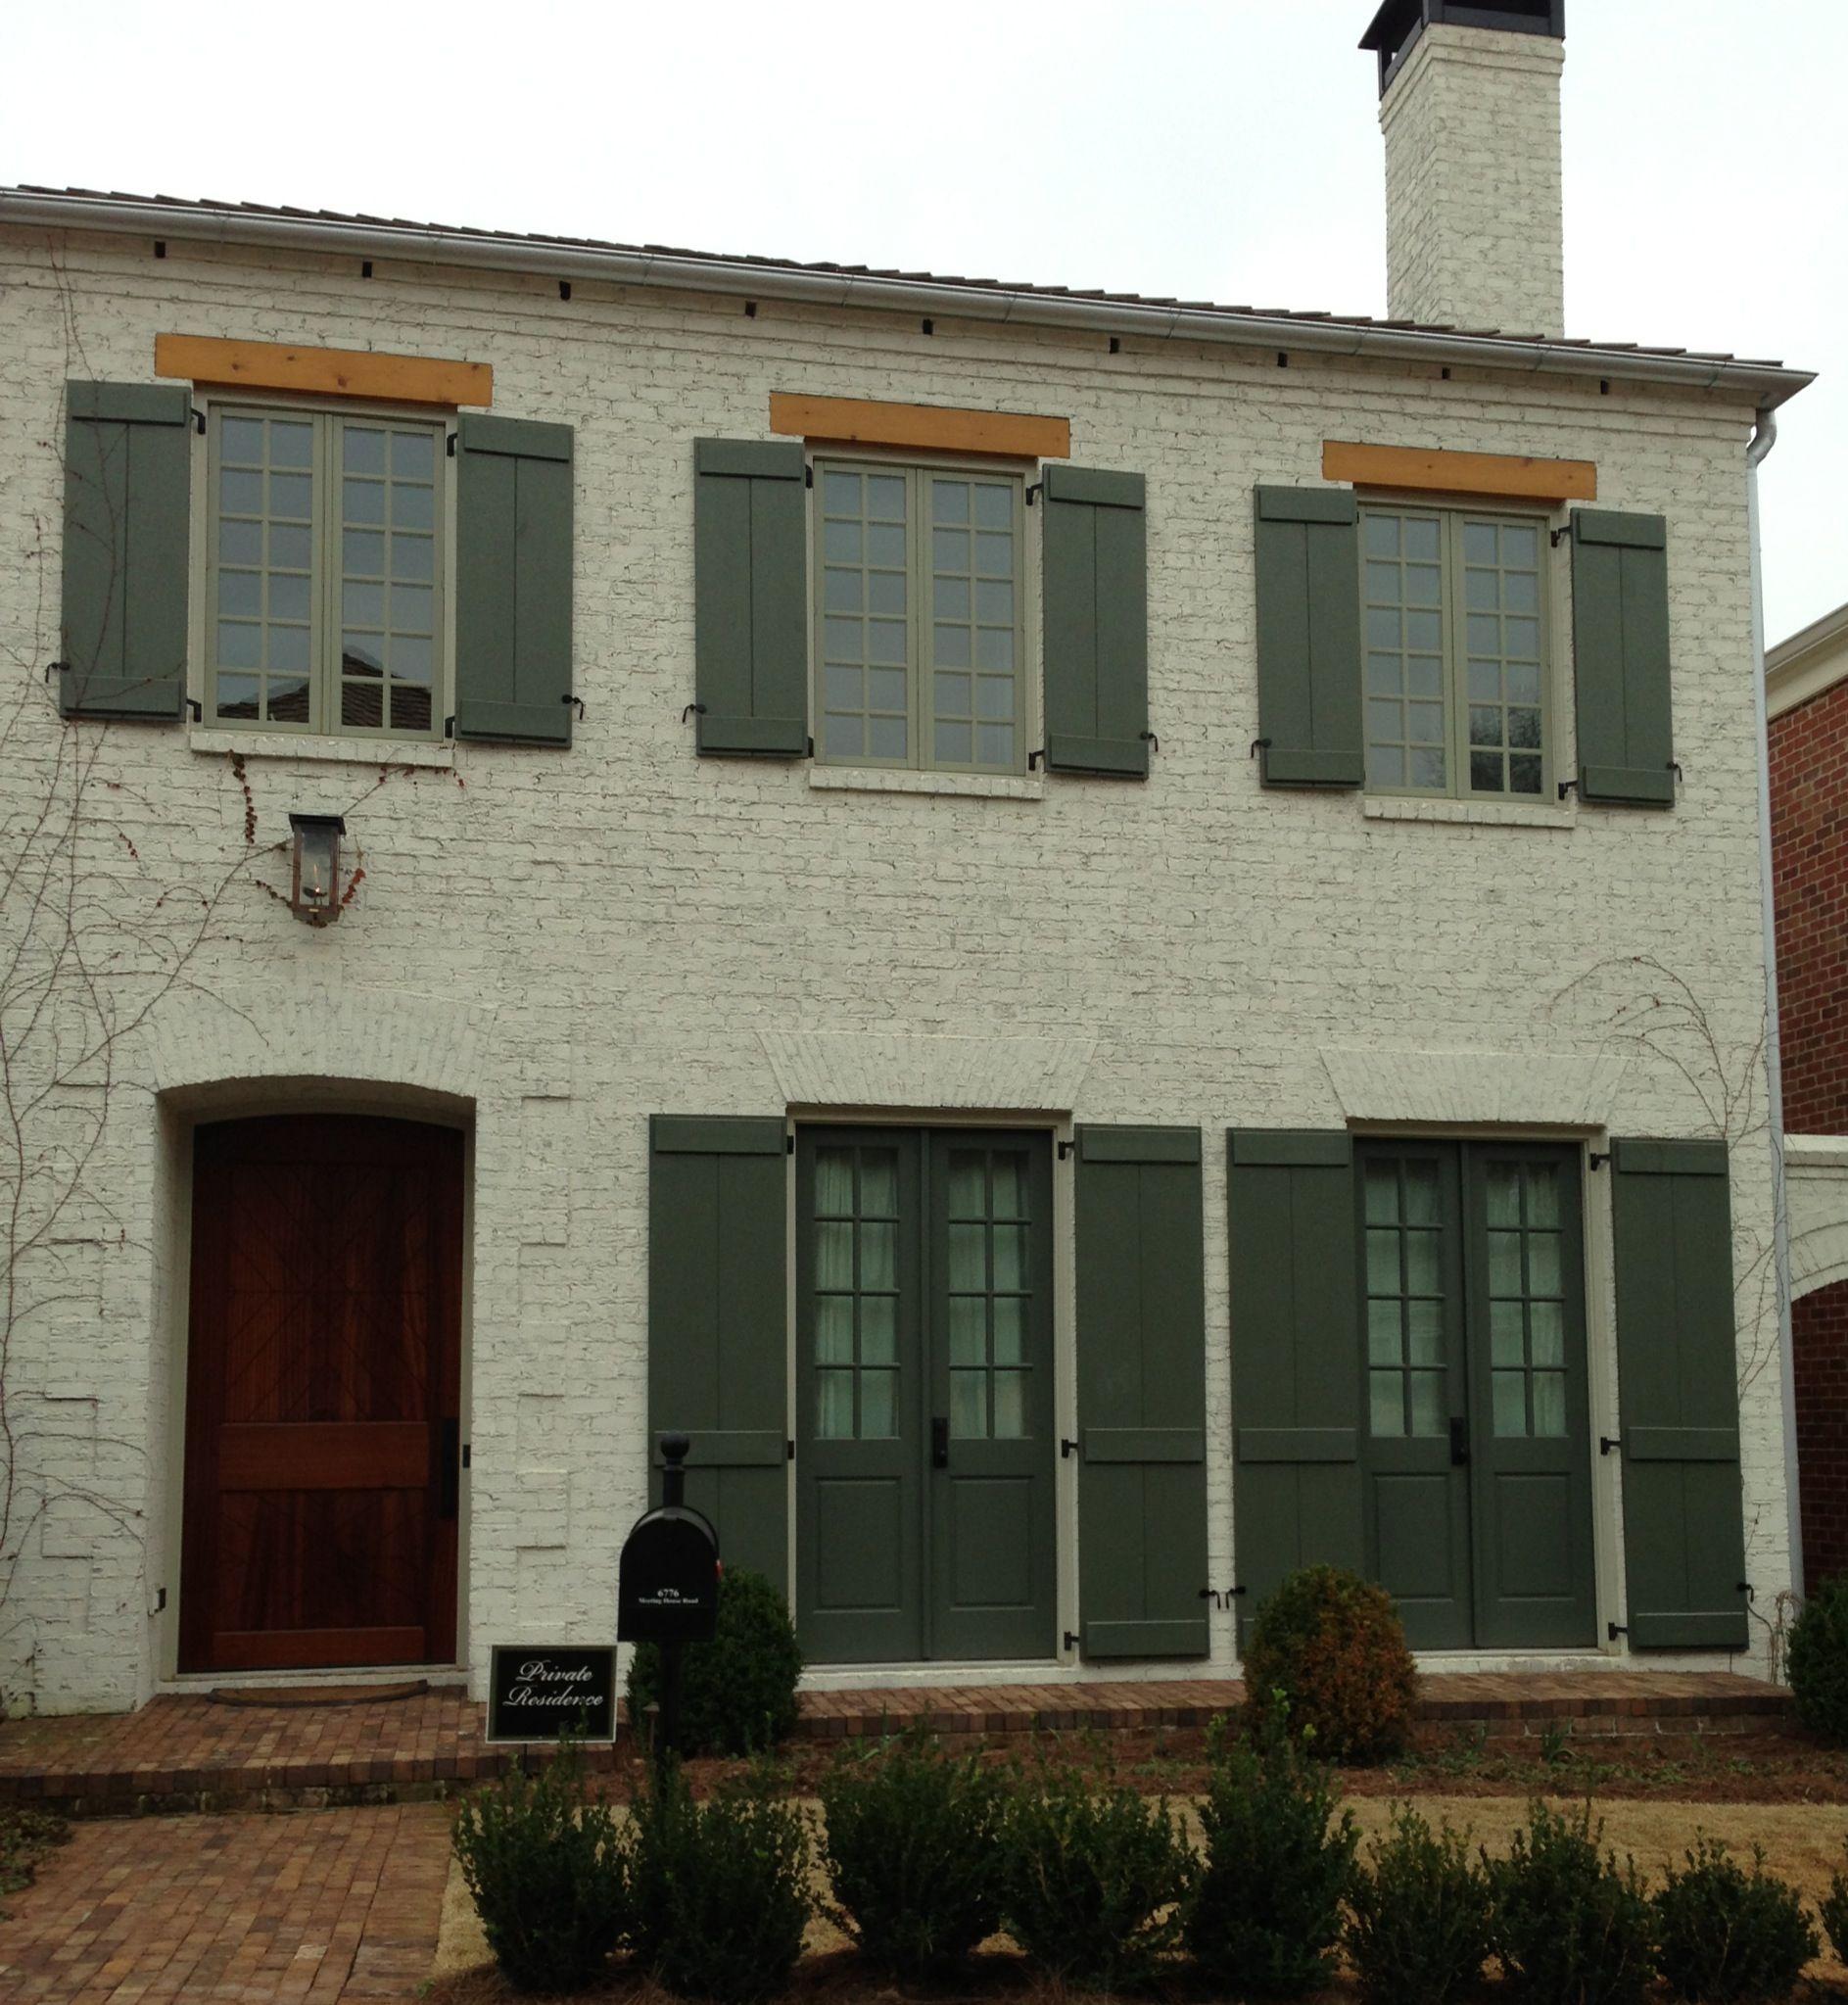 Best Exterior Painted Brick Painted Brick House Exterior 400 x 300